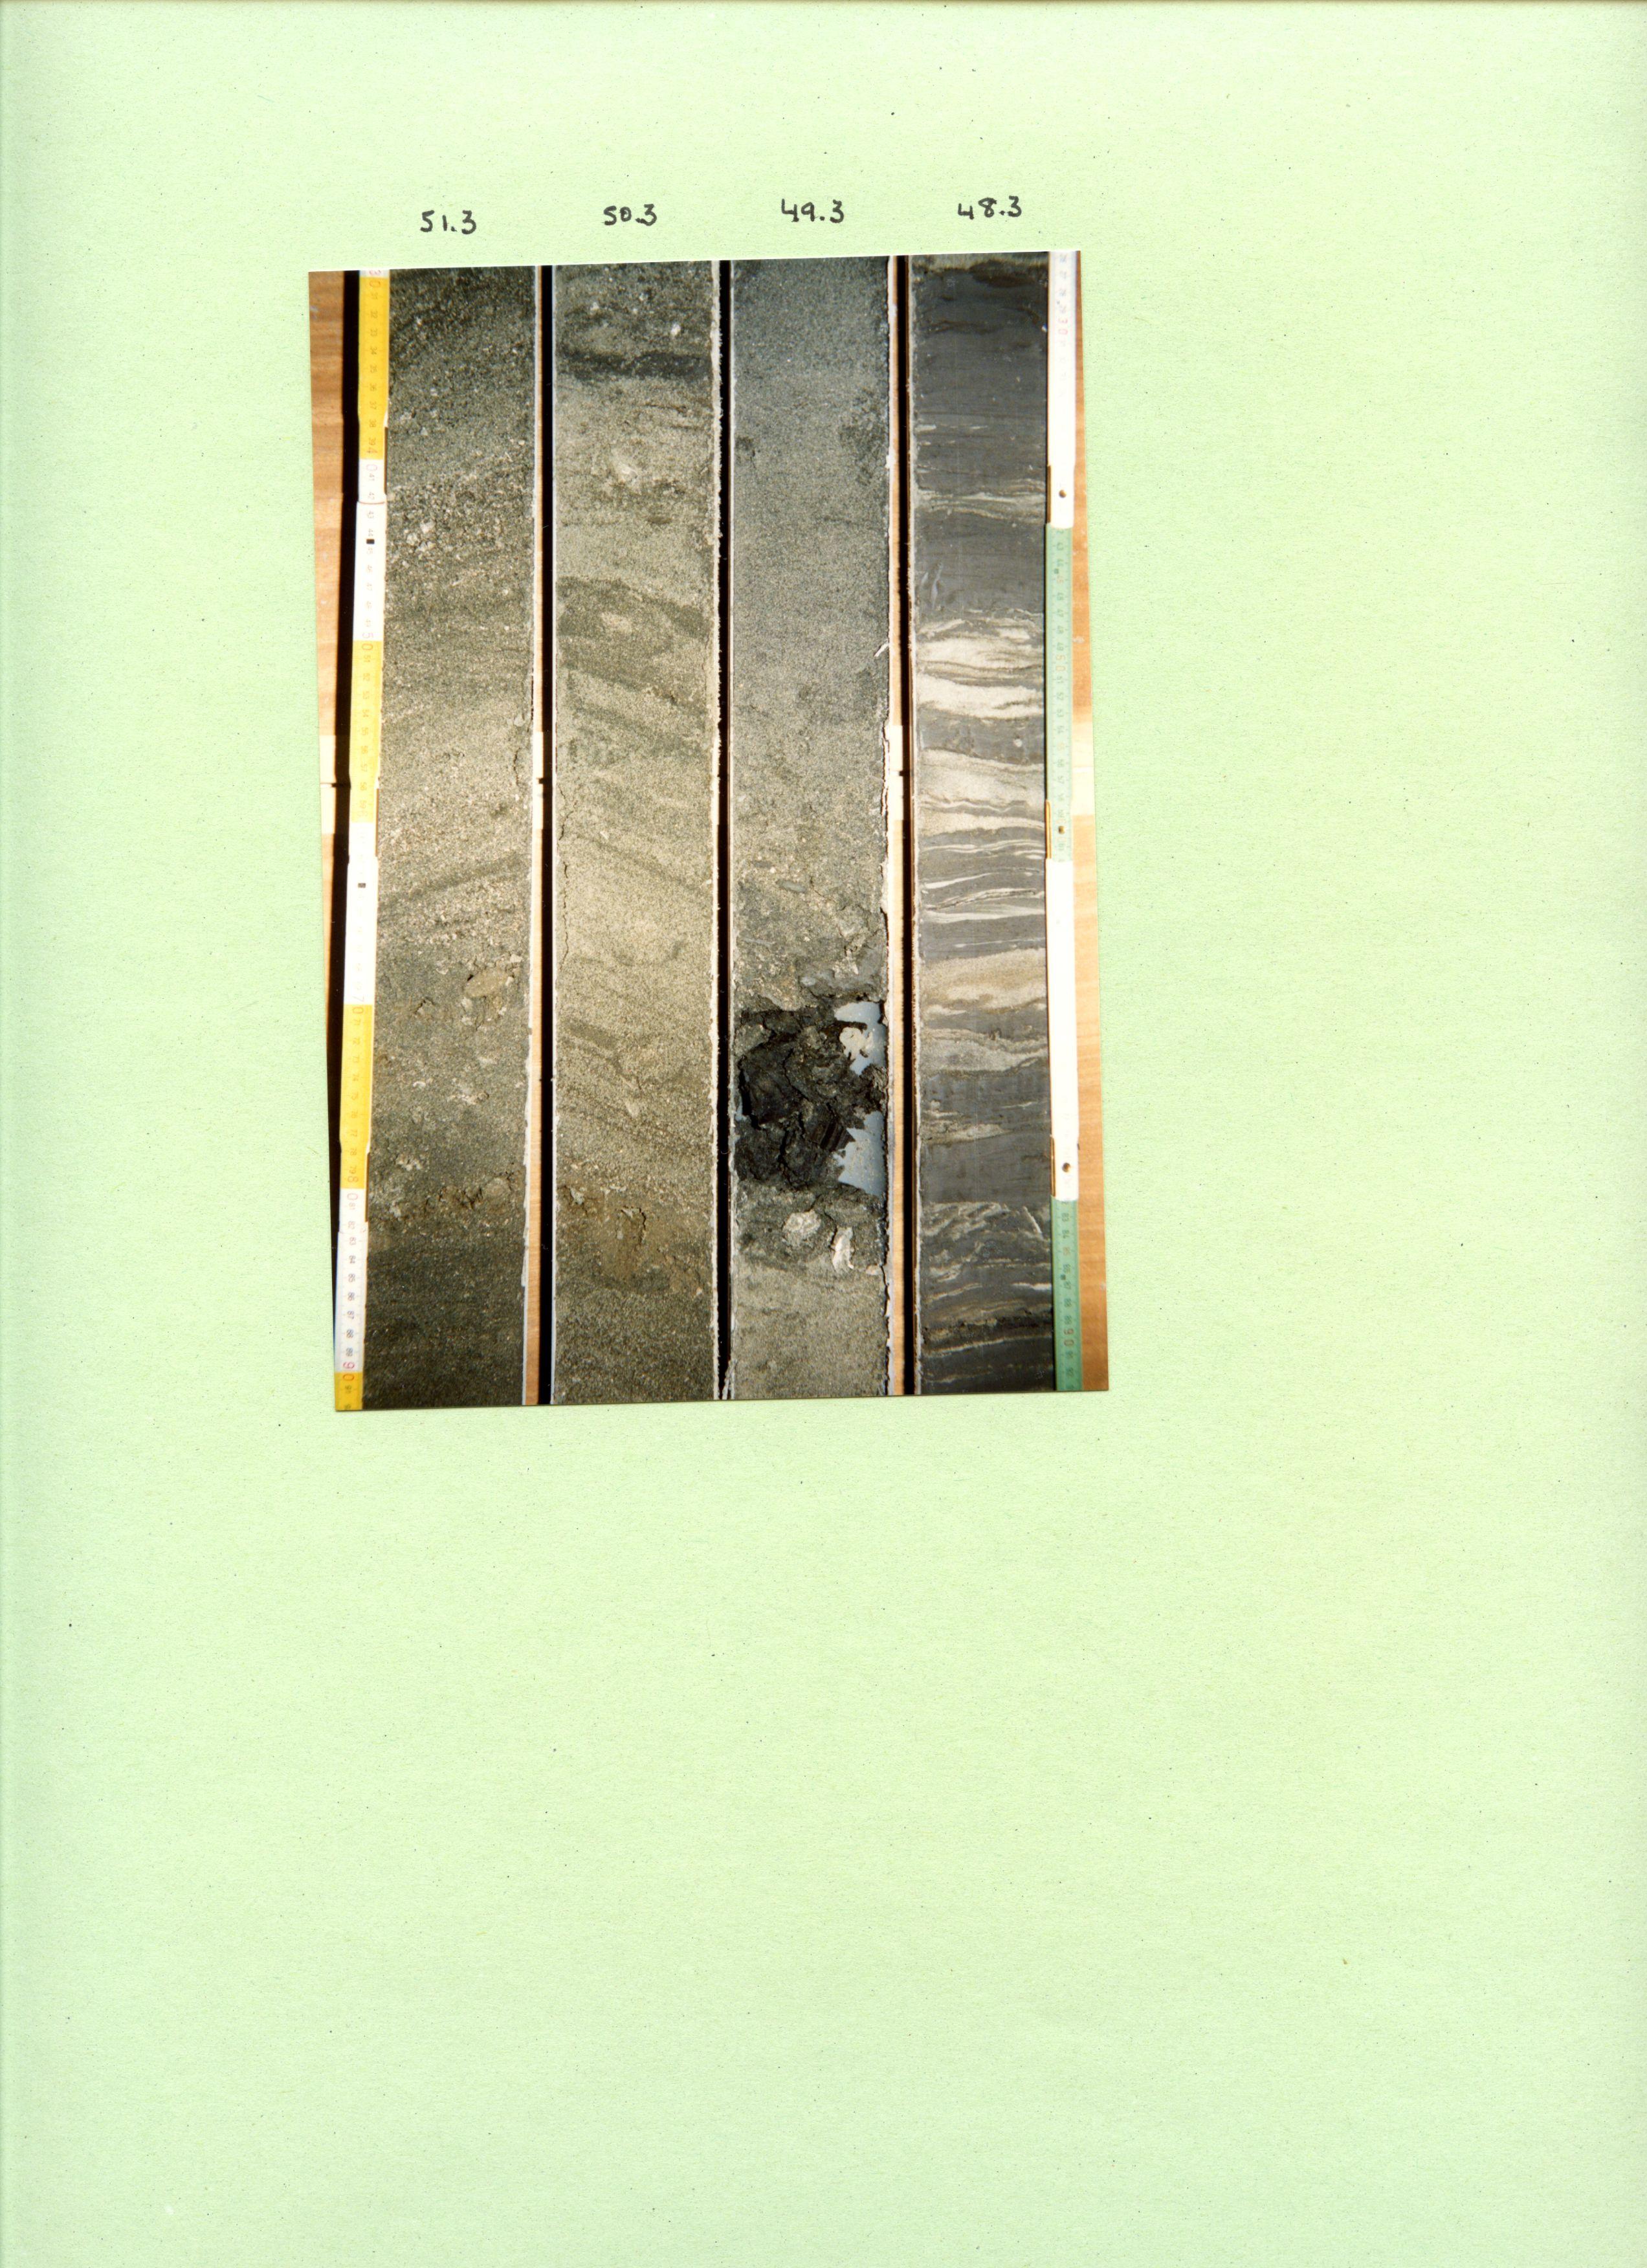 008w0159-pastorijbrug-nr-159-010.jpg